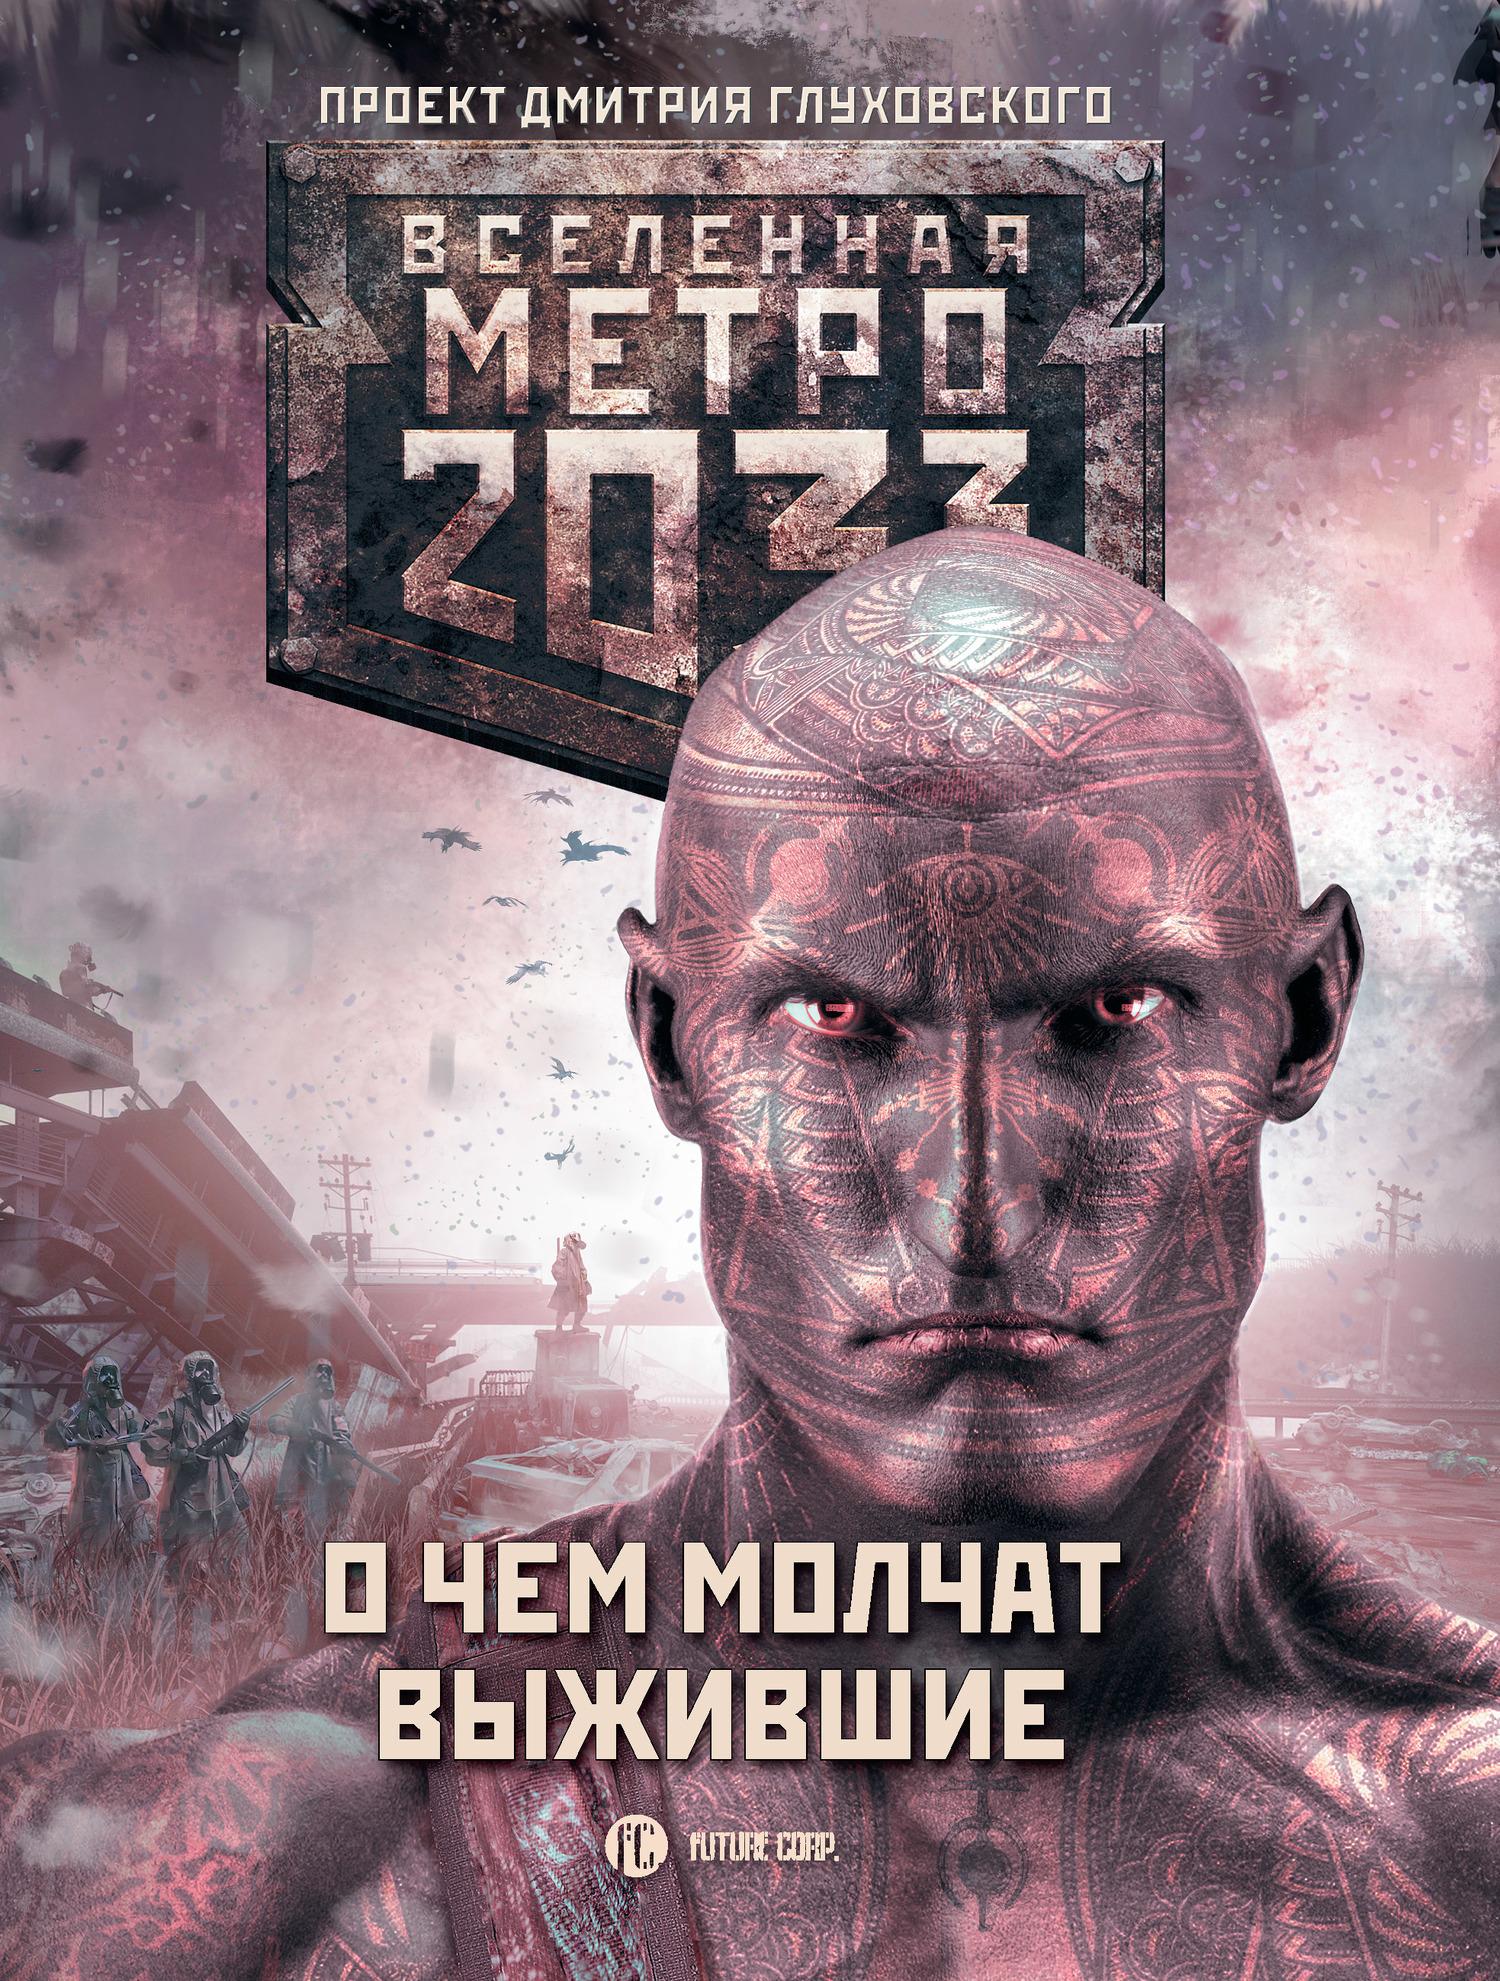 Игорь Вардунас, Борис Харькин - Метро 2033: О чем молчат выжившие (сборник)